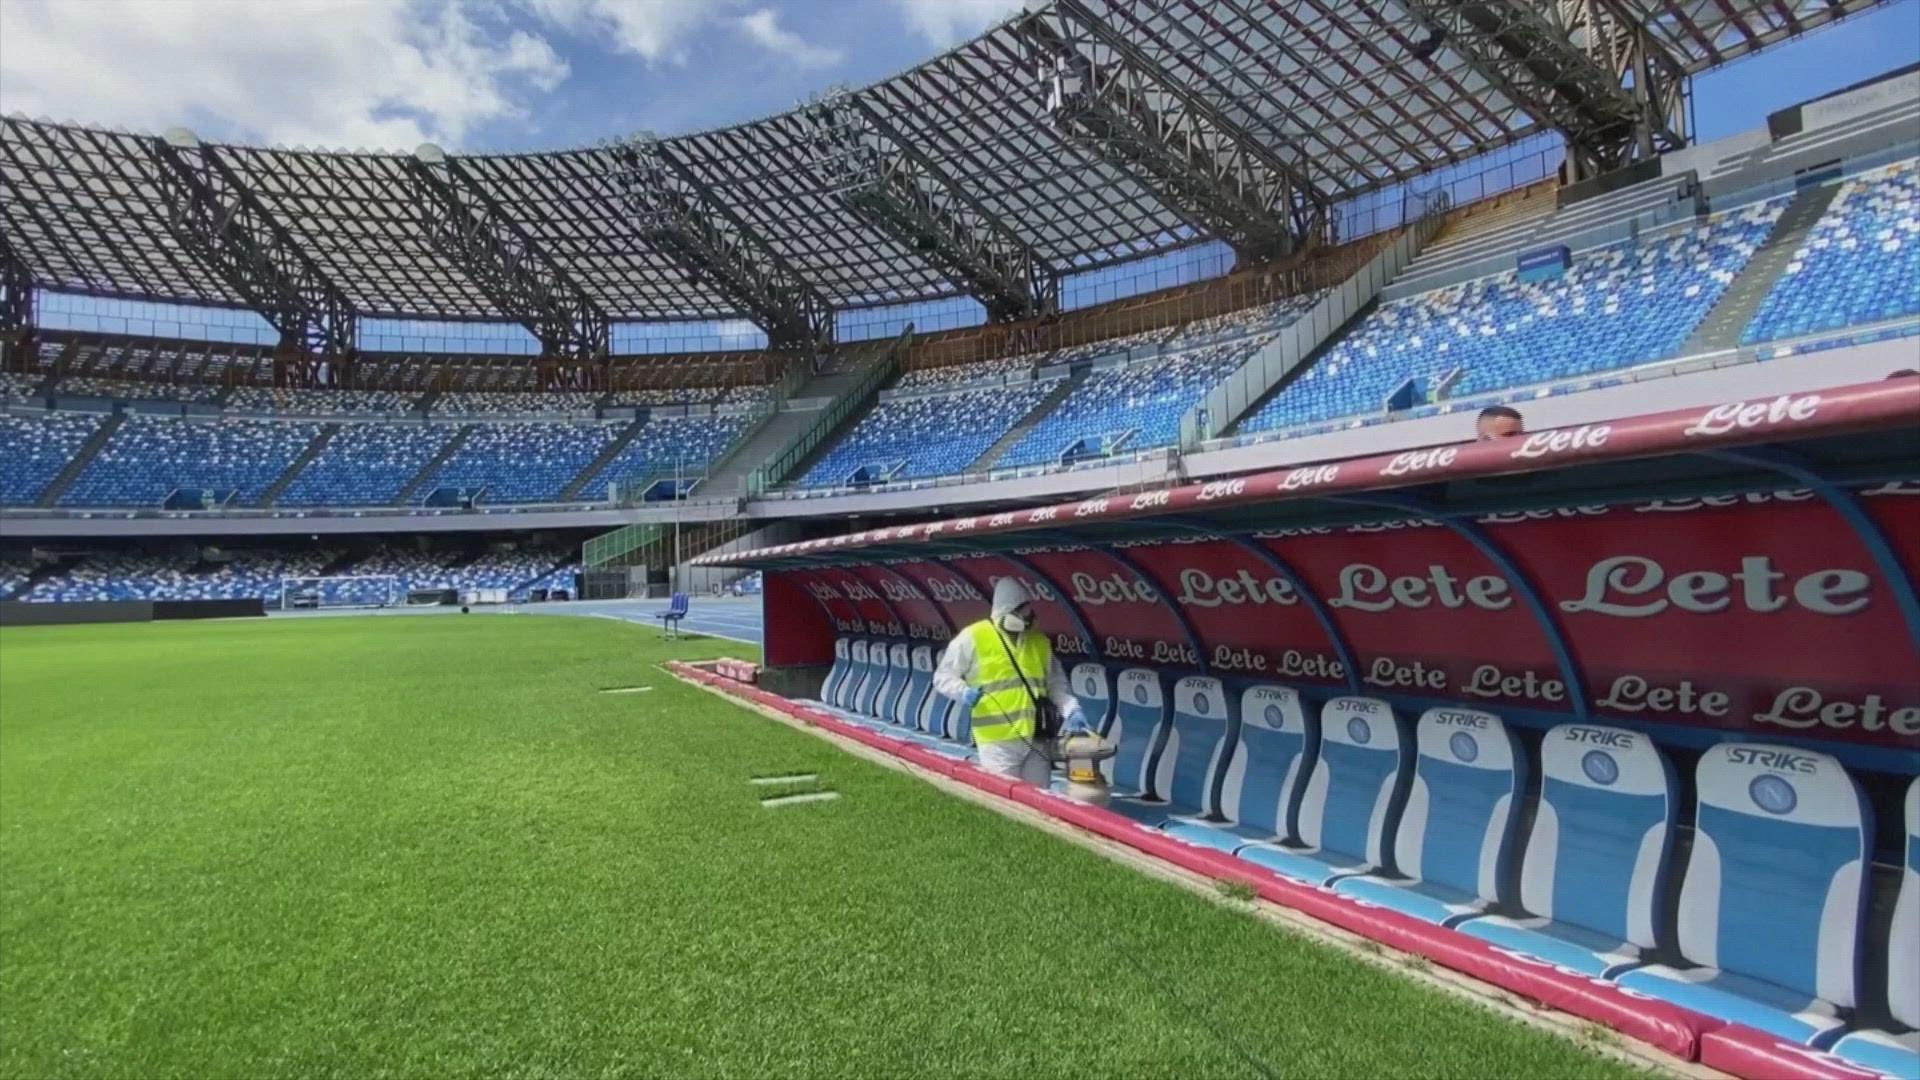 Italian Soccer Stadium Cleaned Sanitized Ahead Of Coppa Italia Semi Final Matches Kare11 Com